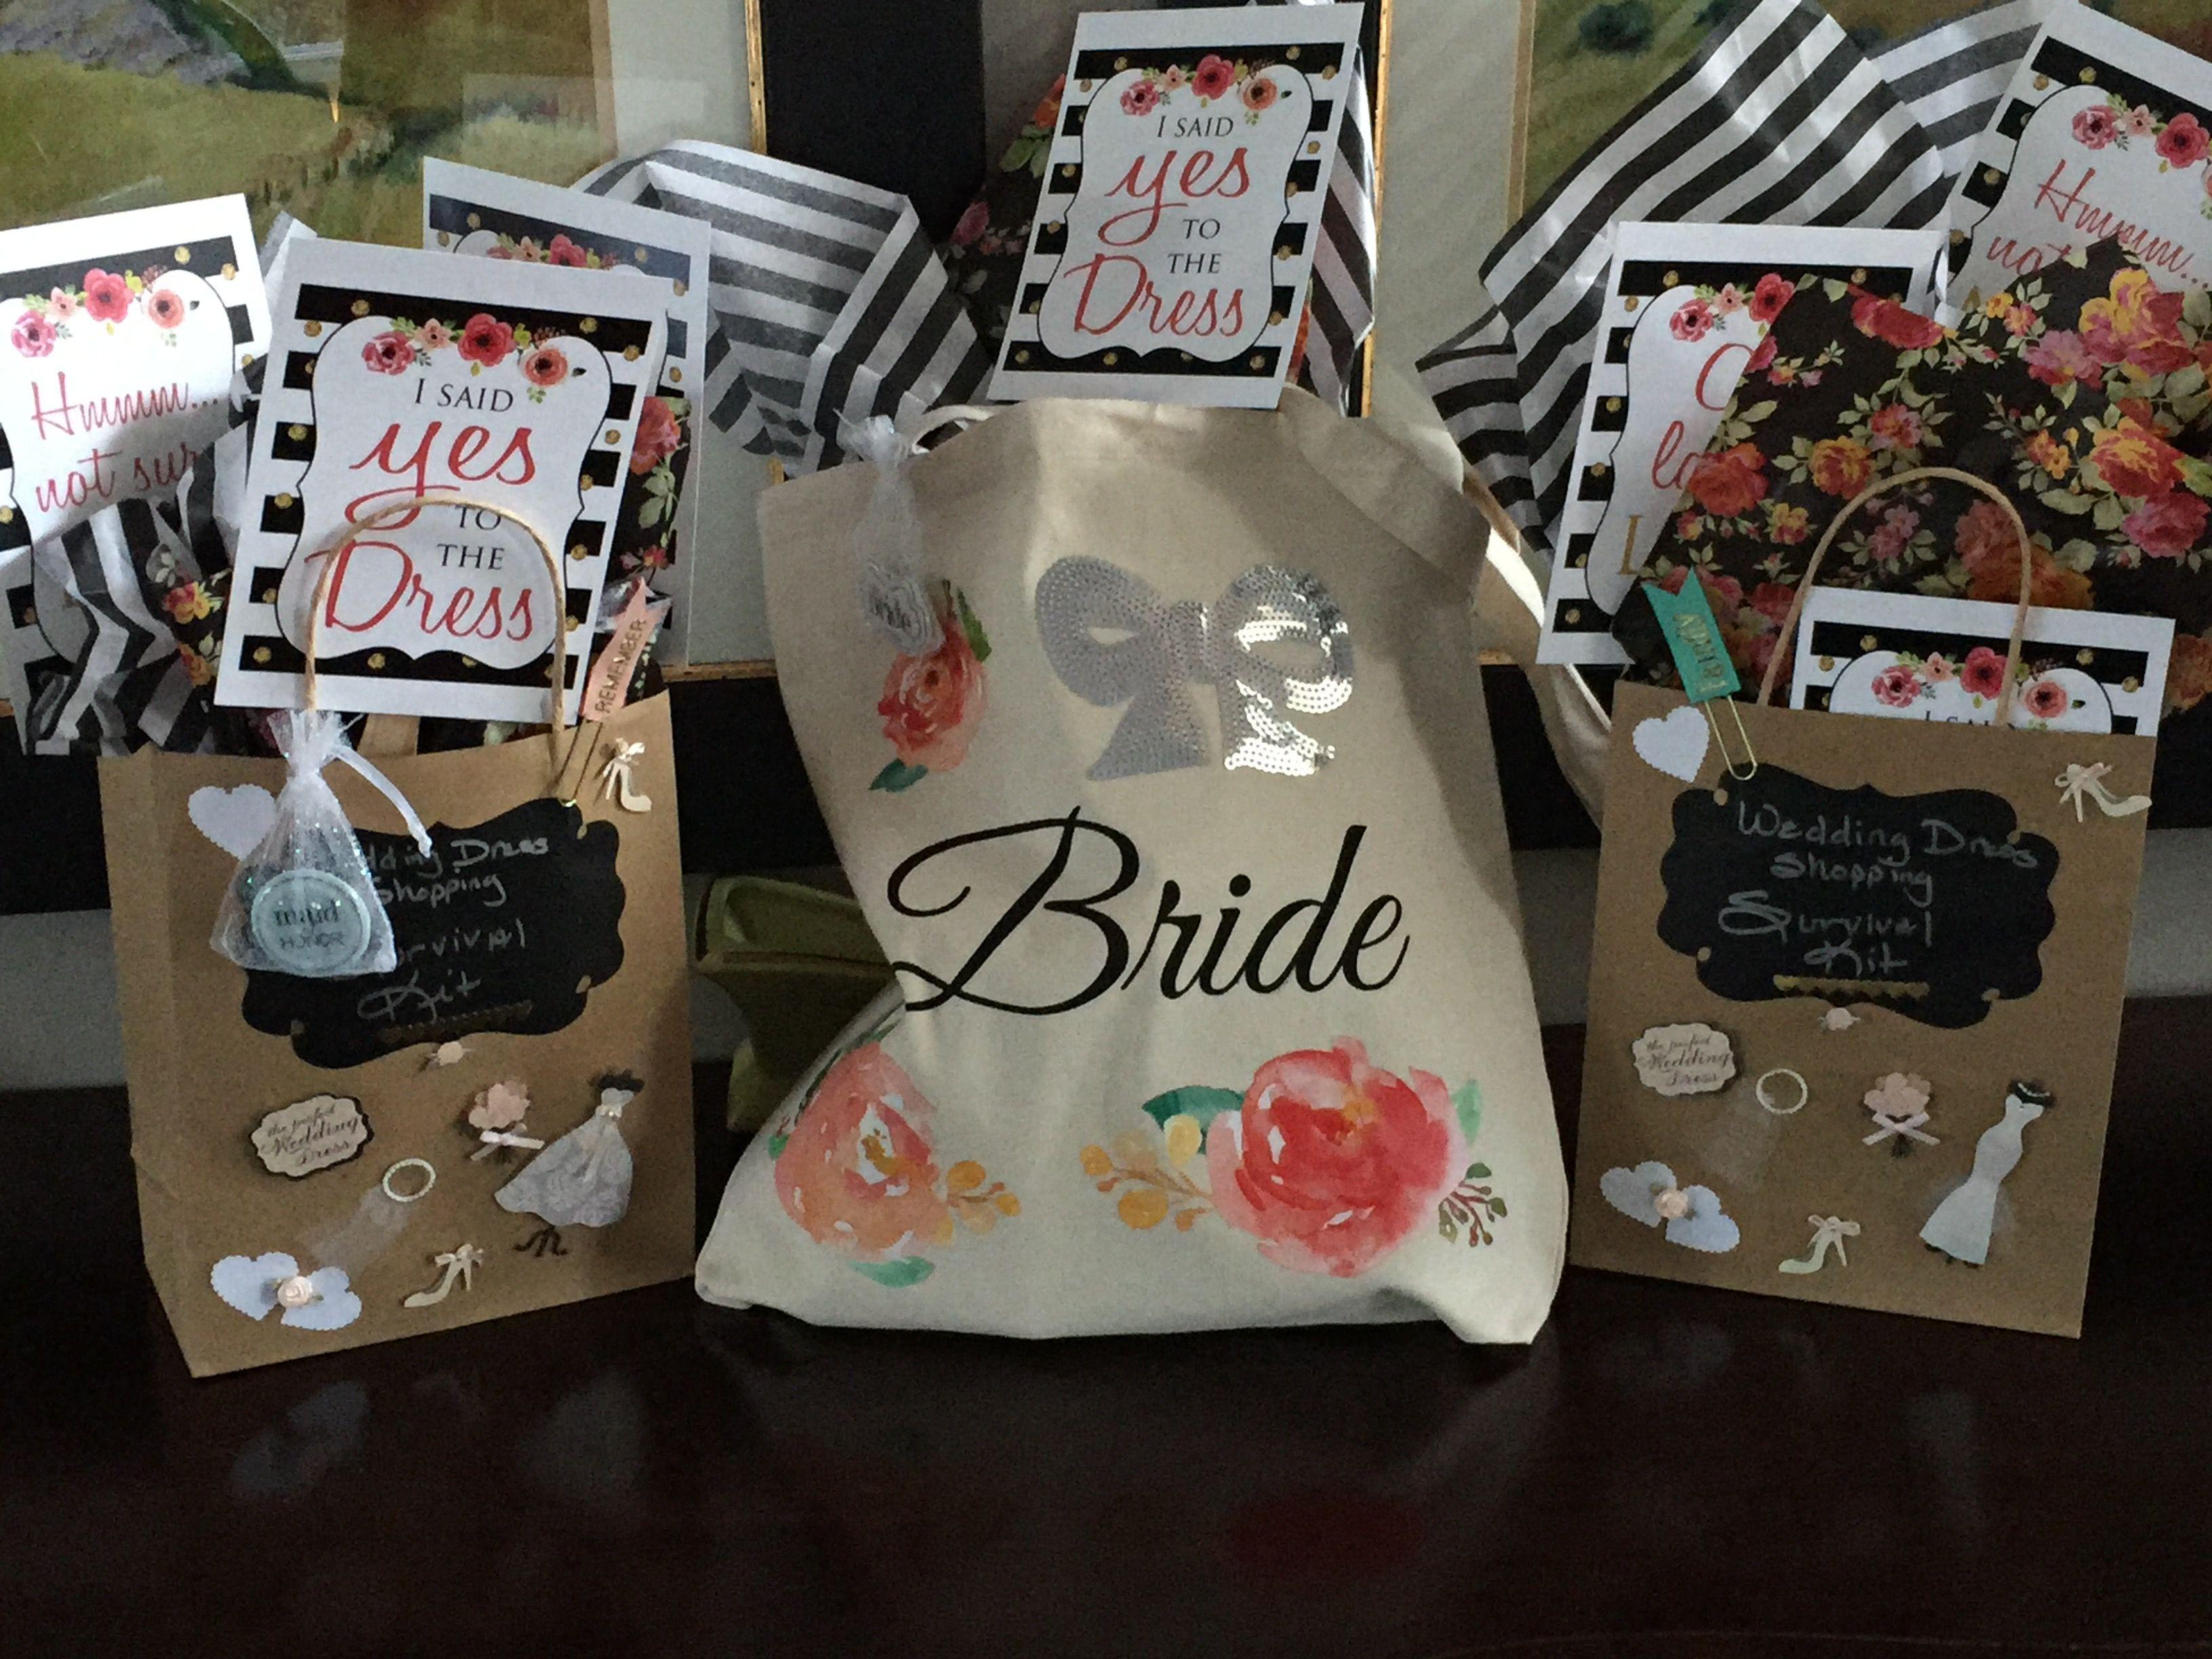 Wedding Dress Shopping Survival Kit Wedding Dress Shopping Survival Kit Wedding Dress Shopping Fun Dress Shopping Fun,Mother Of The Groom Beach Wedding Dress